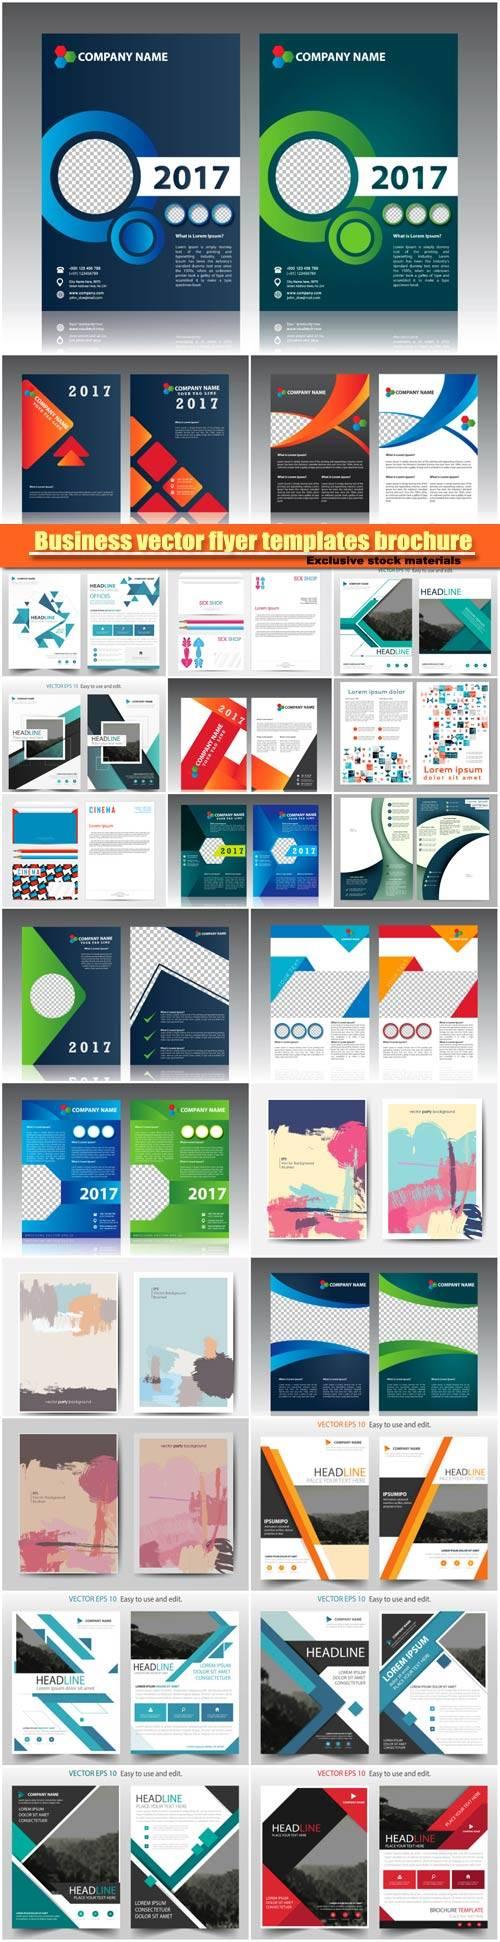 Business vector flyer templates brochure